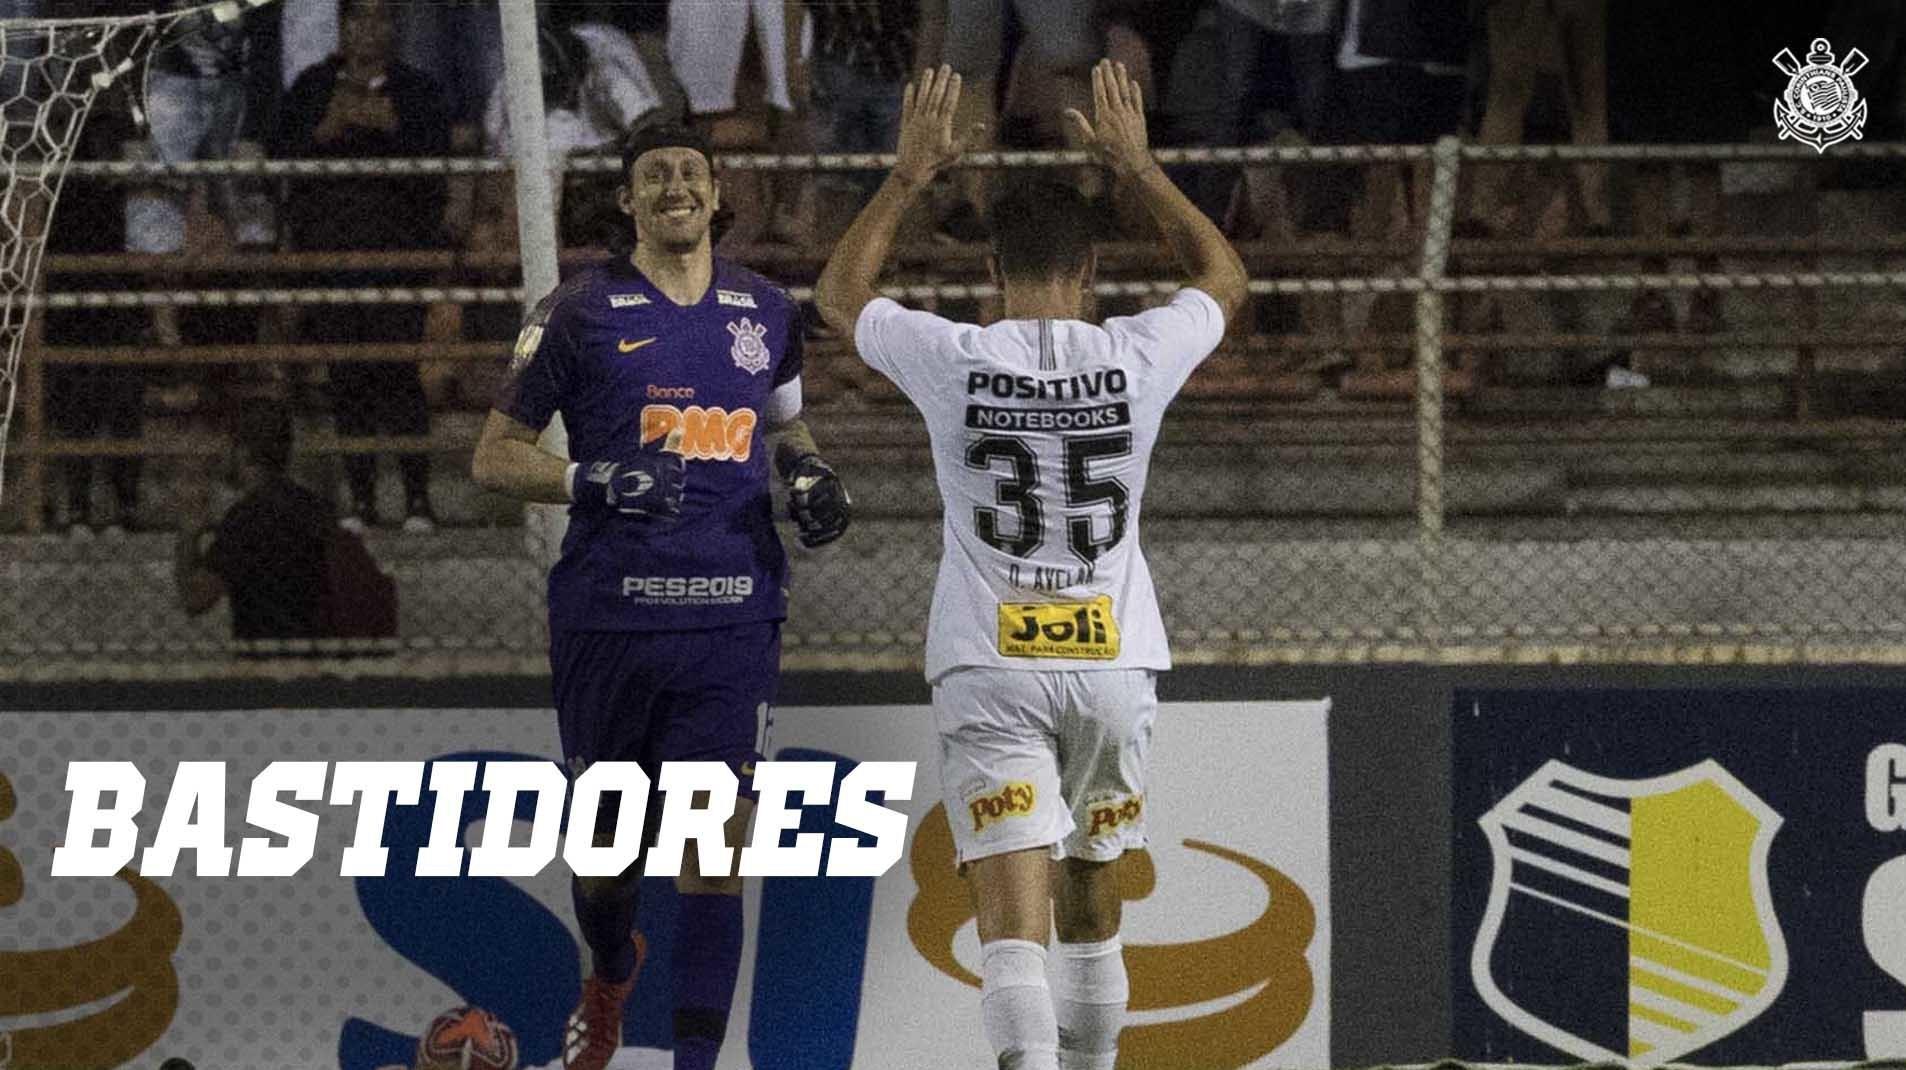 Bastidores de Corinthians vs Ituano